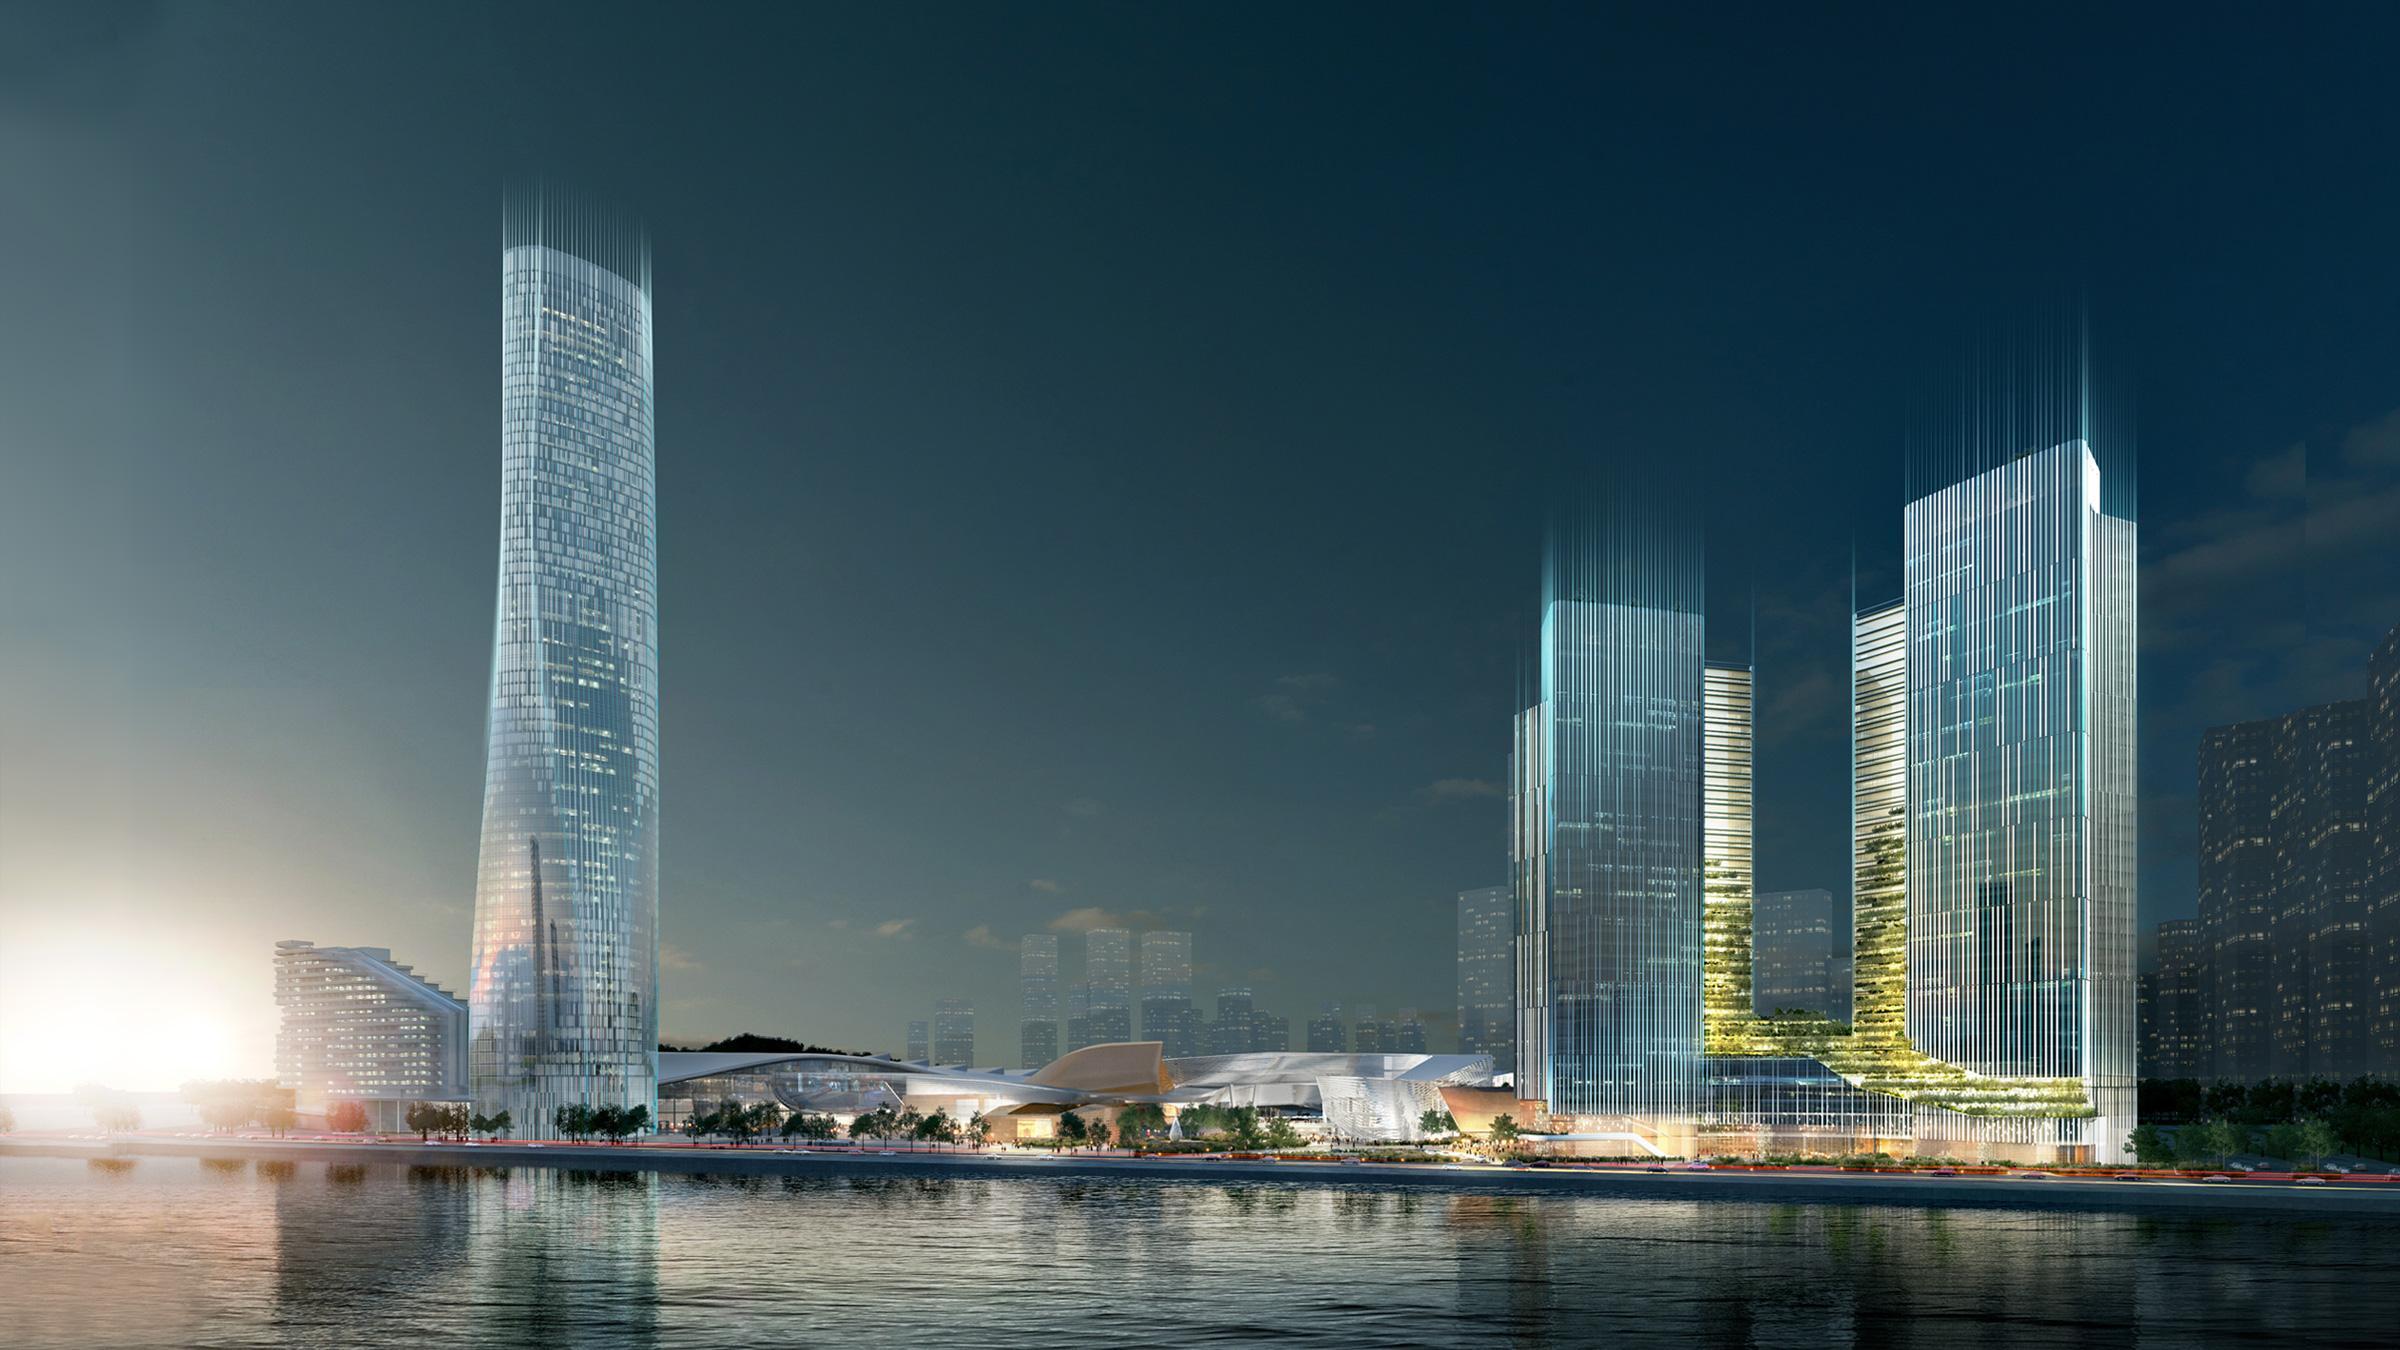 10 Design Zhuhai International Convention And Exhibition